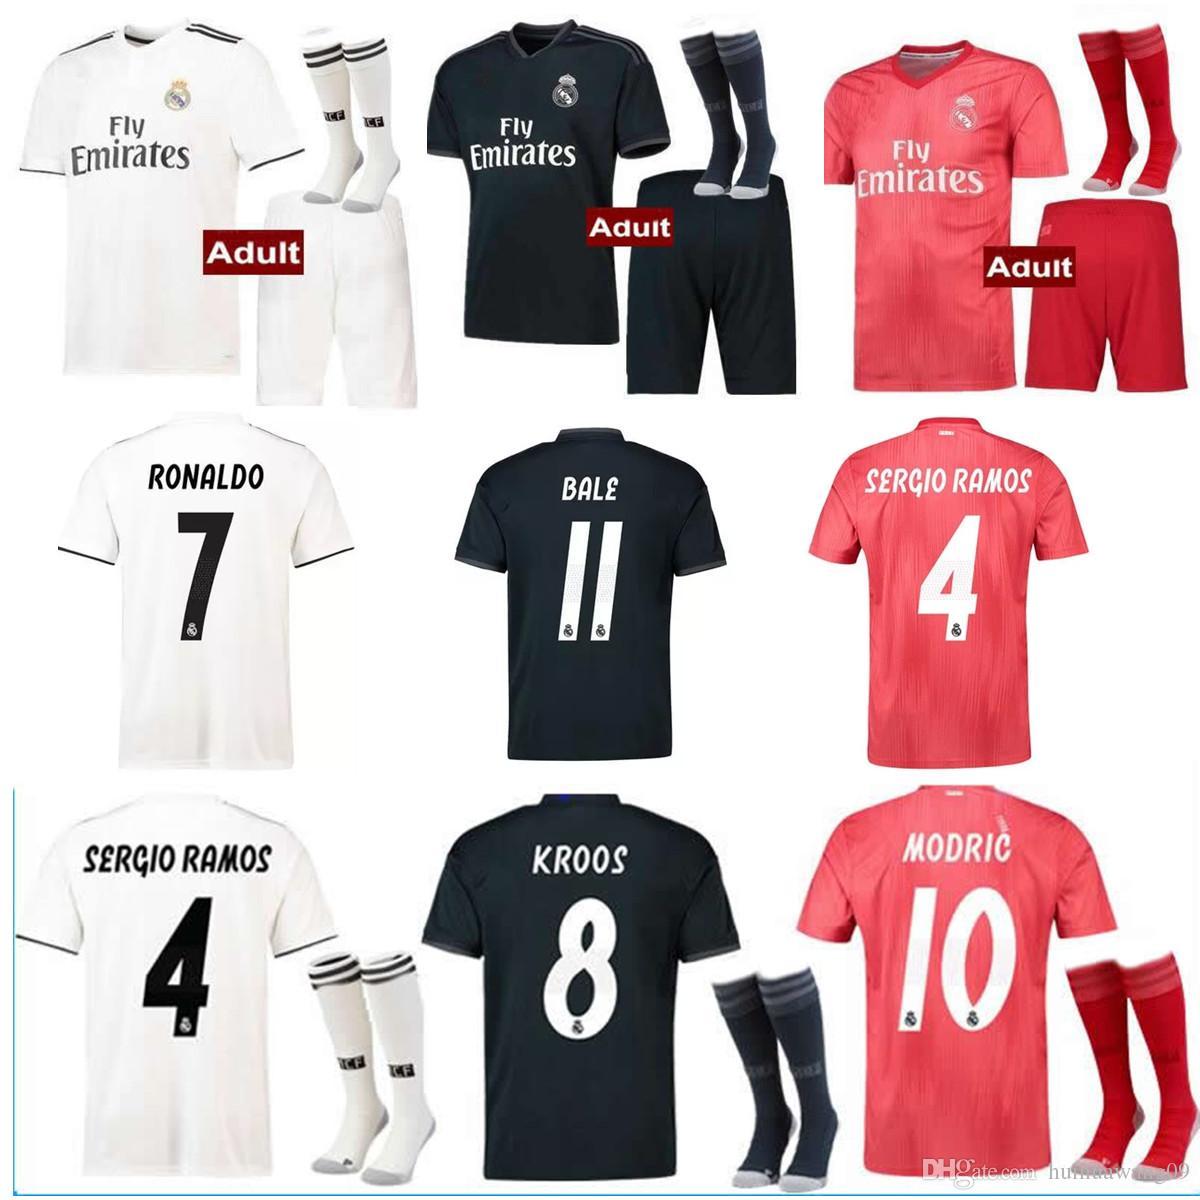 f76409f8db162 Compre MEN Kits + Calcetines 18 19 Real Madrid Ronaldo Jersey De Fútbol  Third Away 2018 2019 Asensio MODRIC Bale Uniformes SERGIO RAMOS ISCO Camisetas  De ...